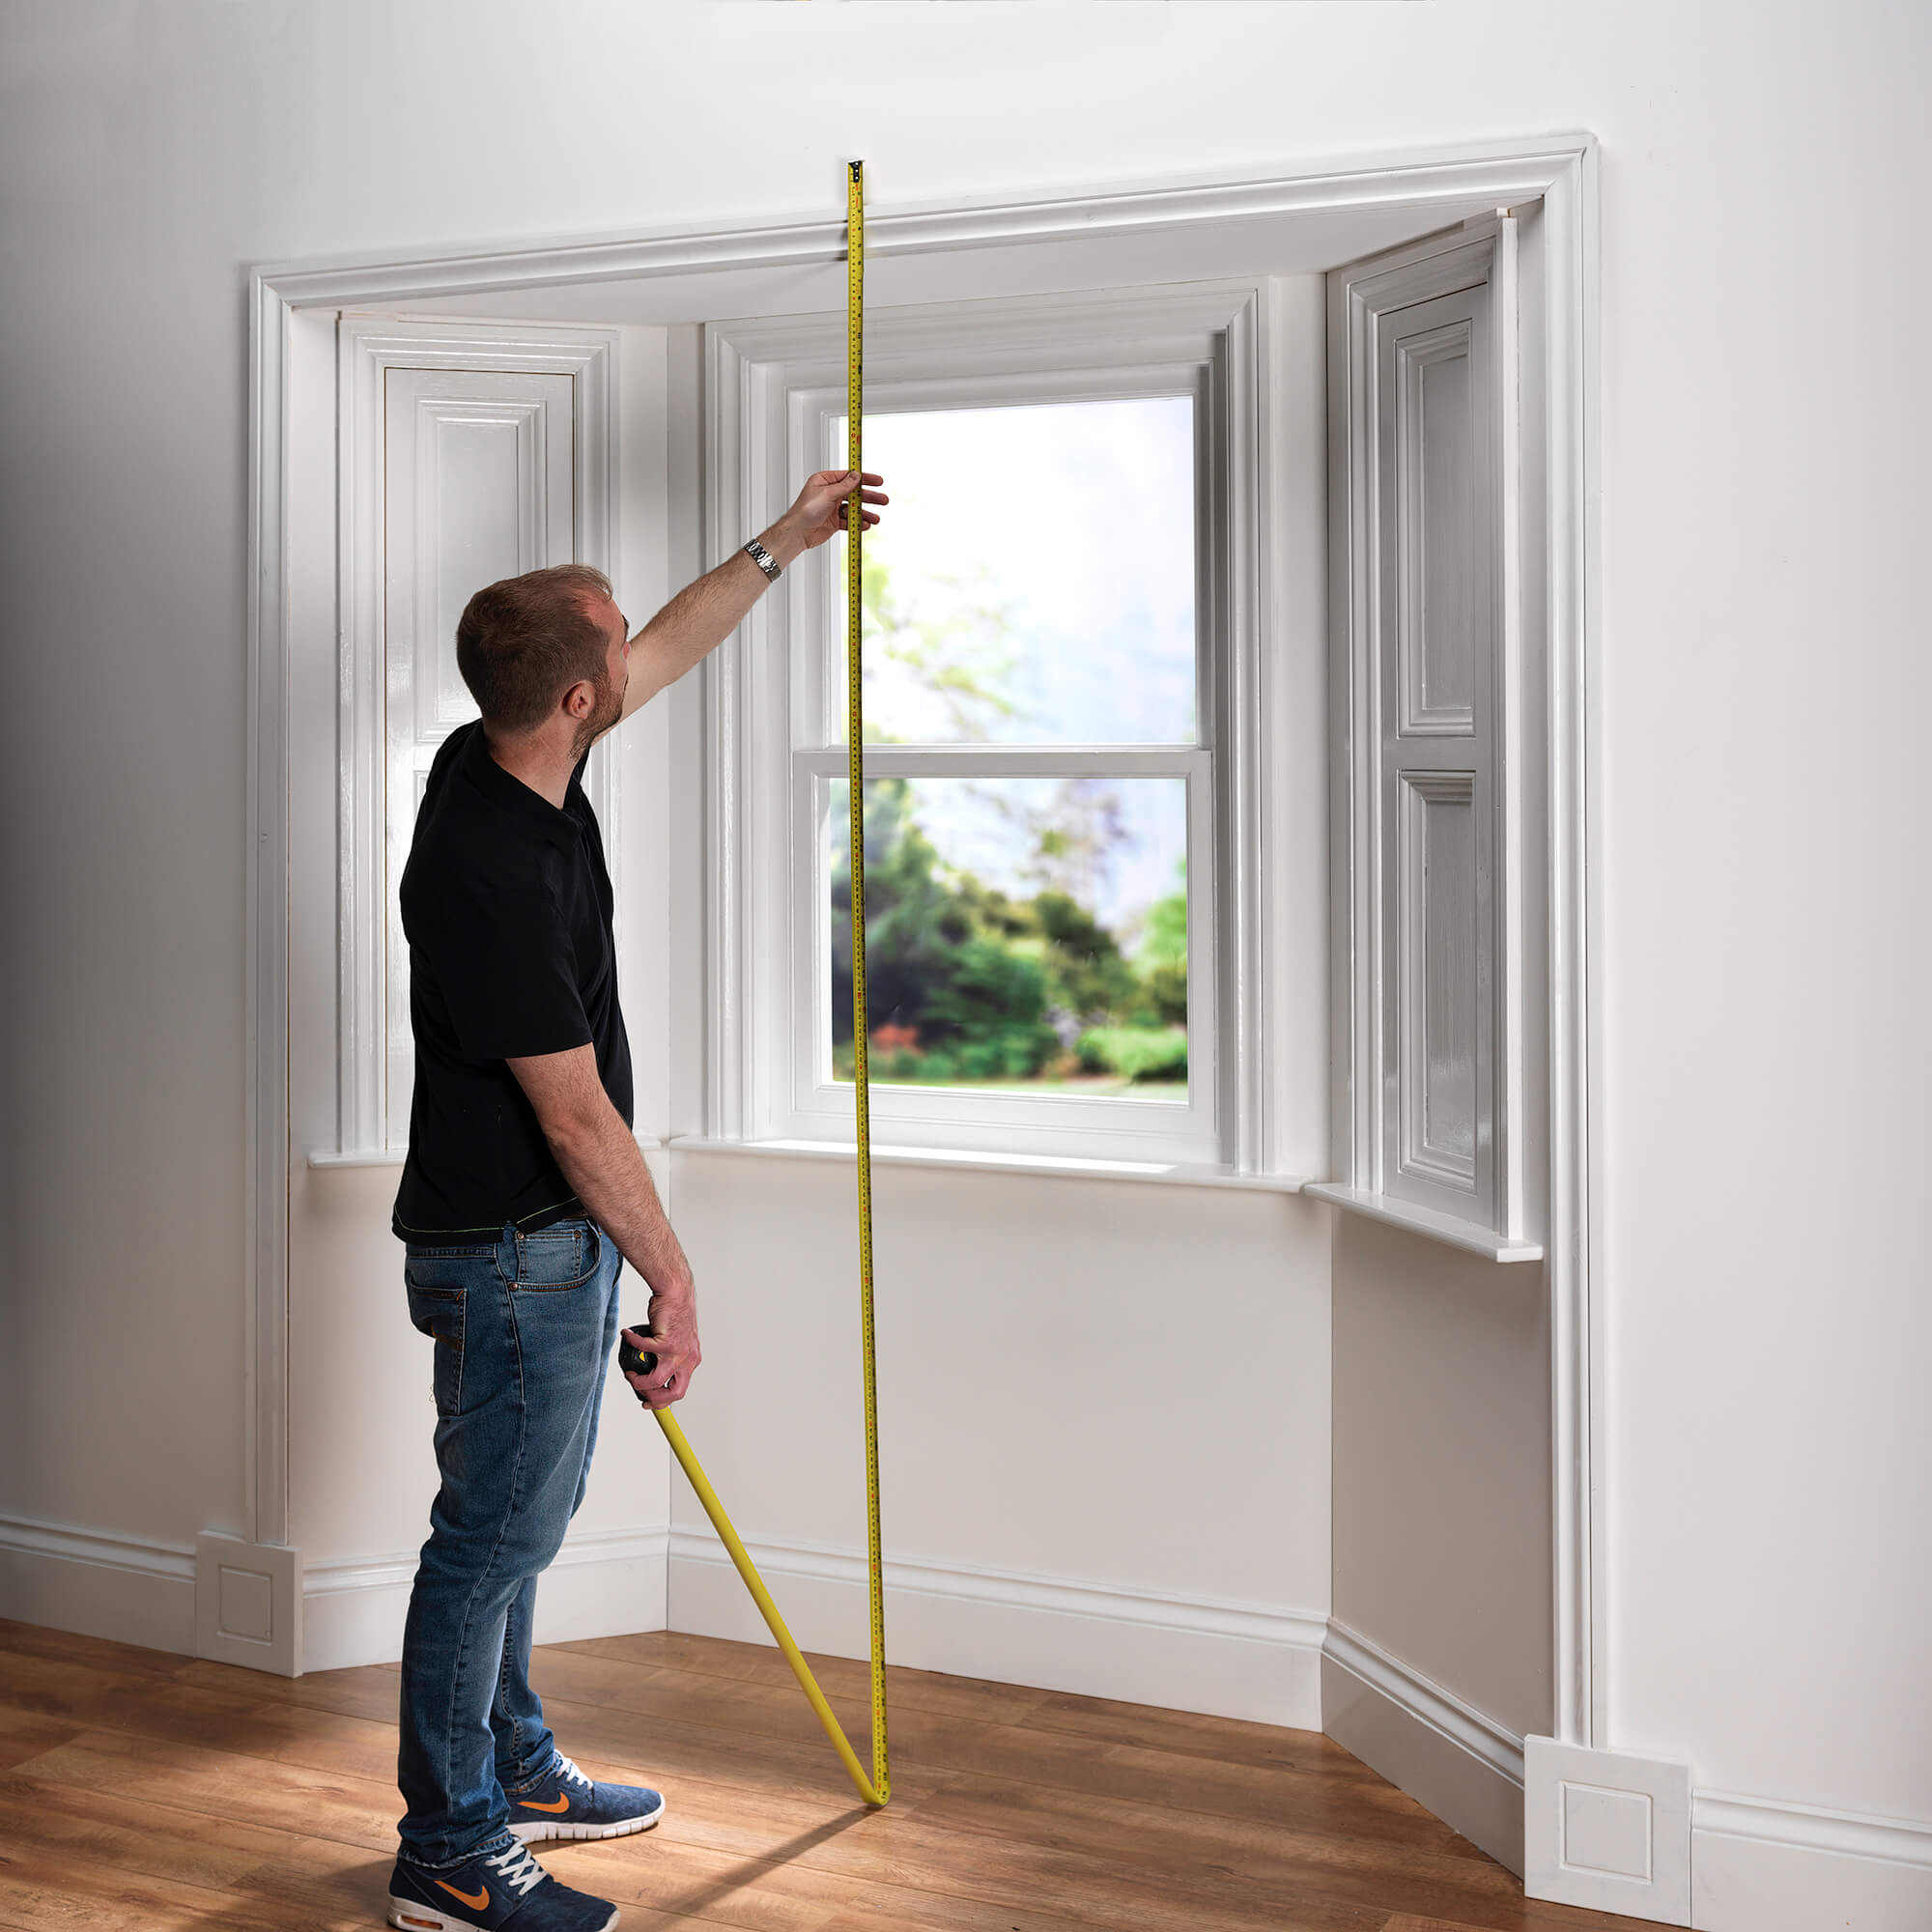 net curtain photography in bay window set